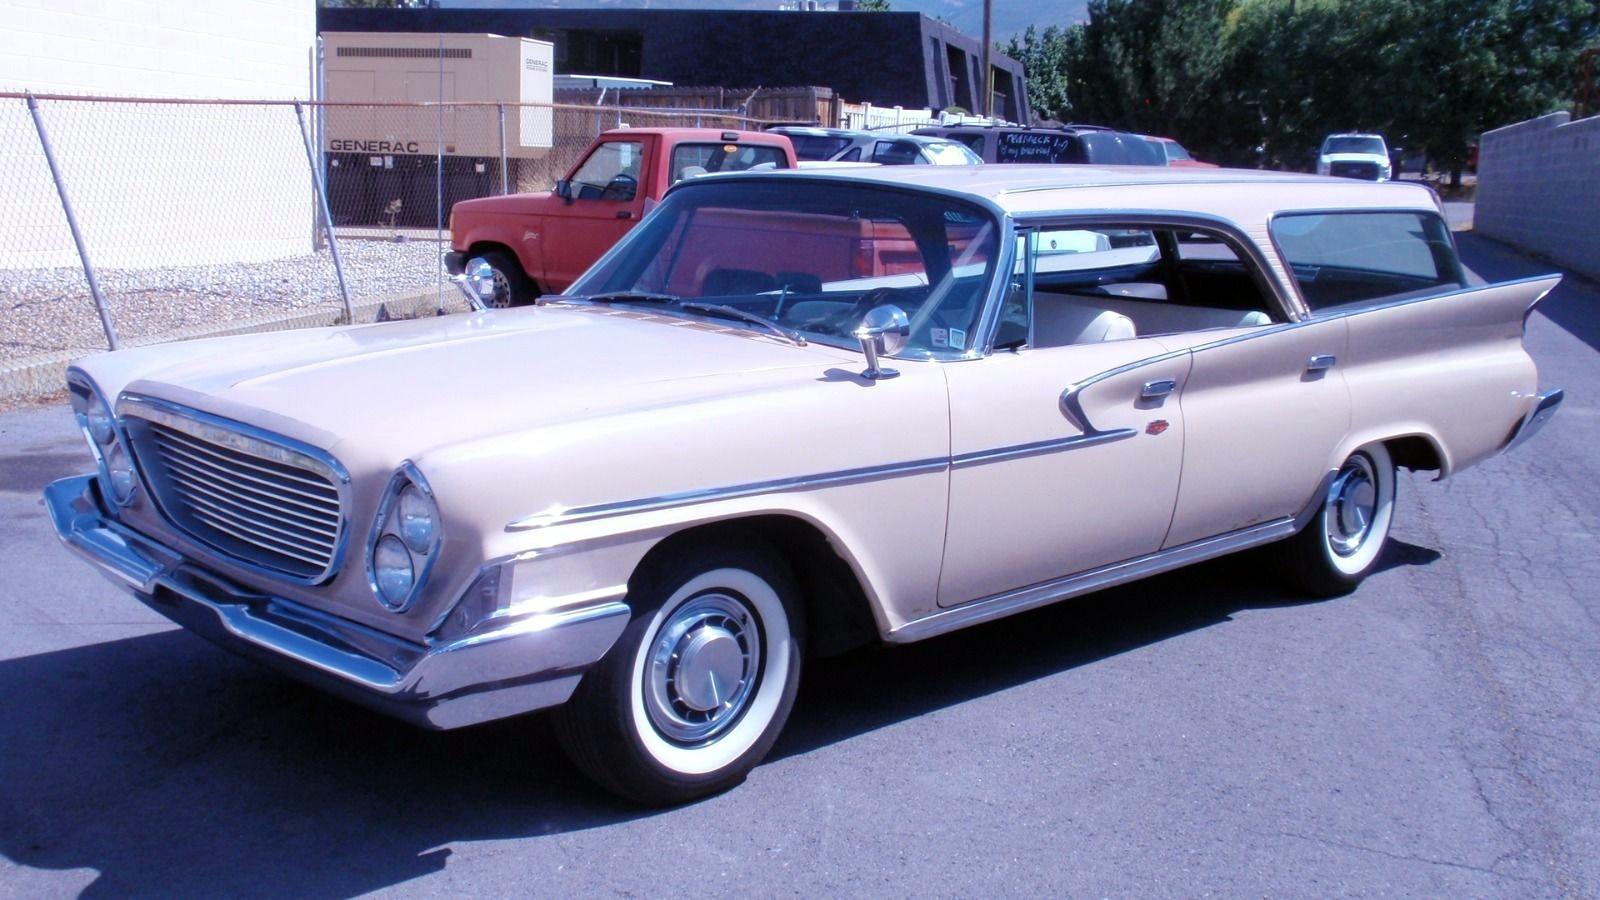 Dodge Power Wagon For Sale >> 440 Powered Wagon: 1961 Chrysler Newport